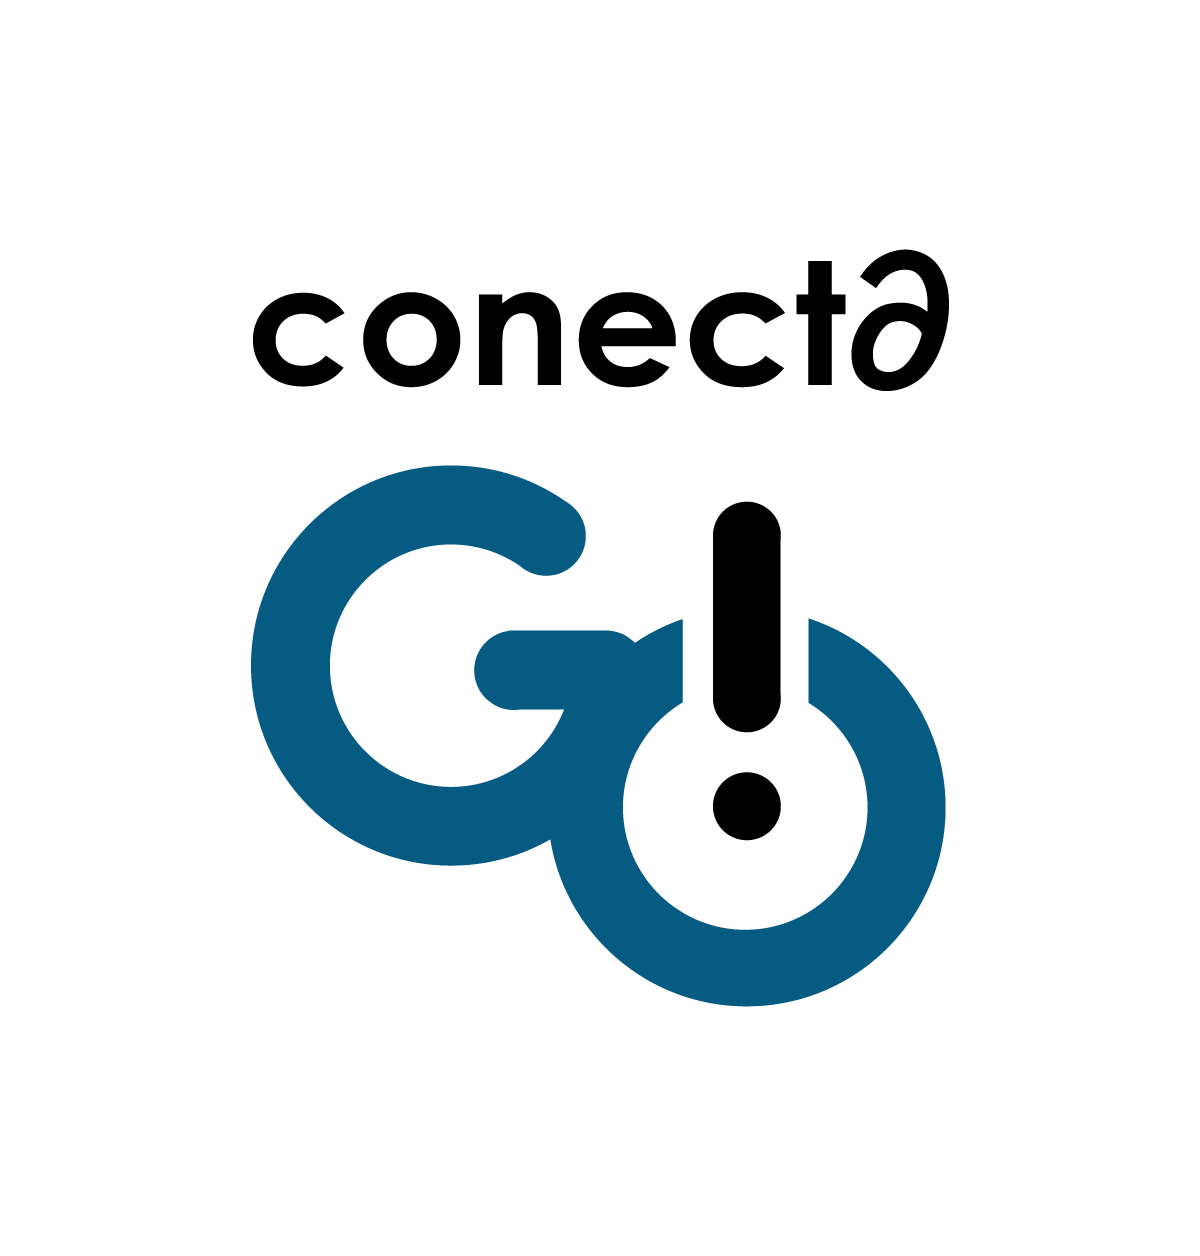 conecta-go-azul-negro-2